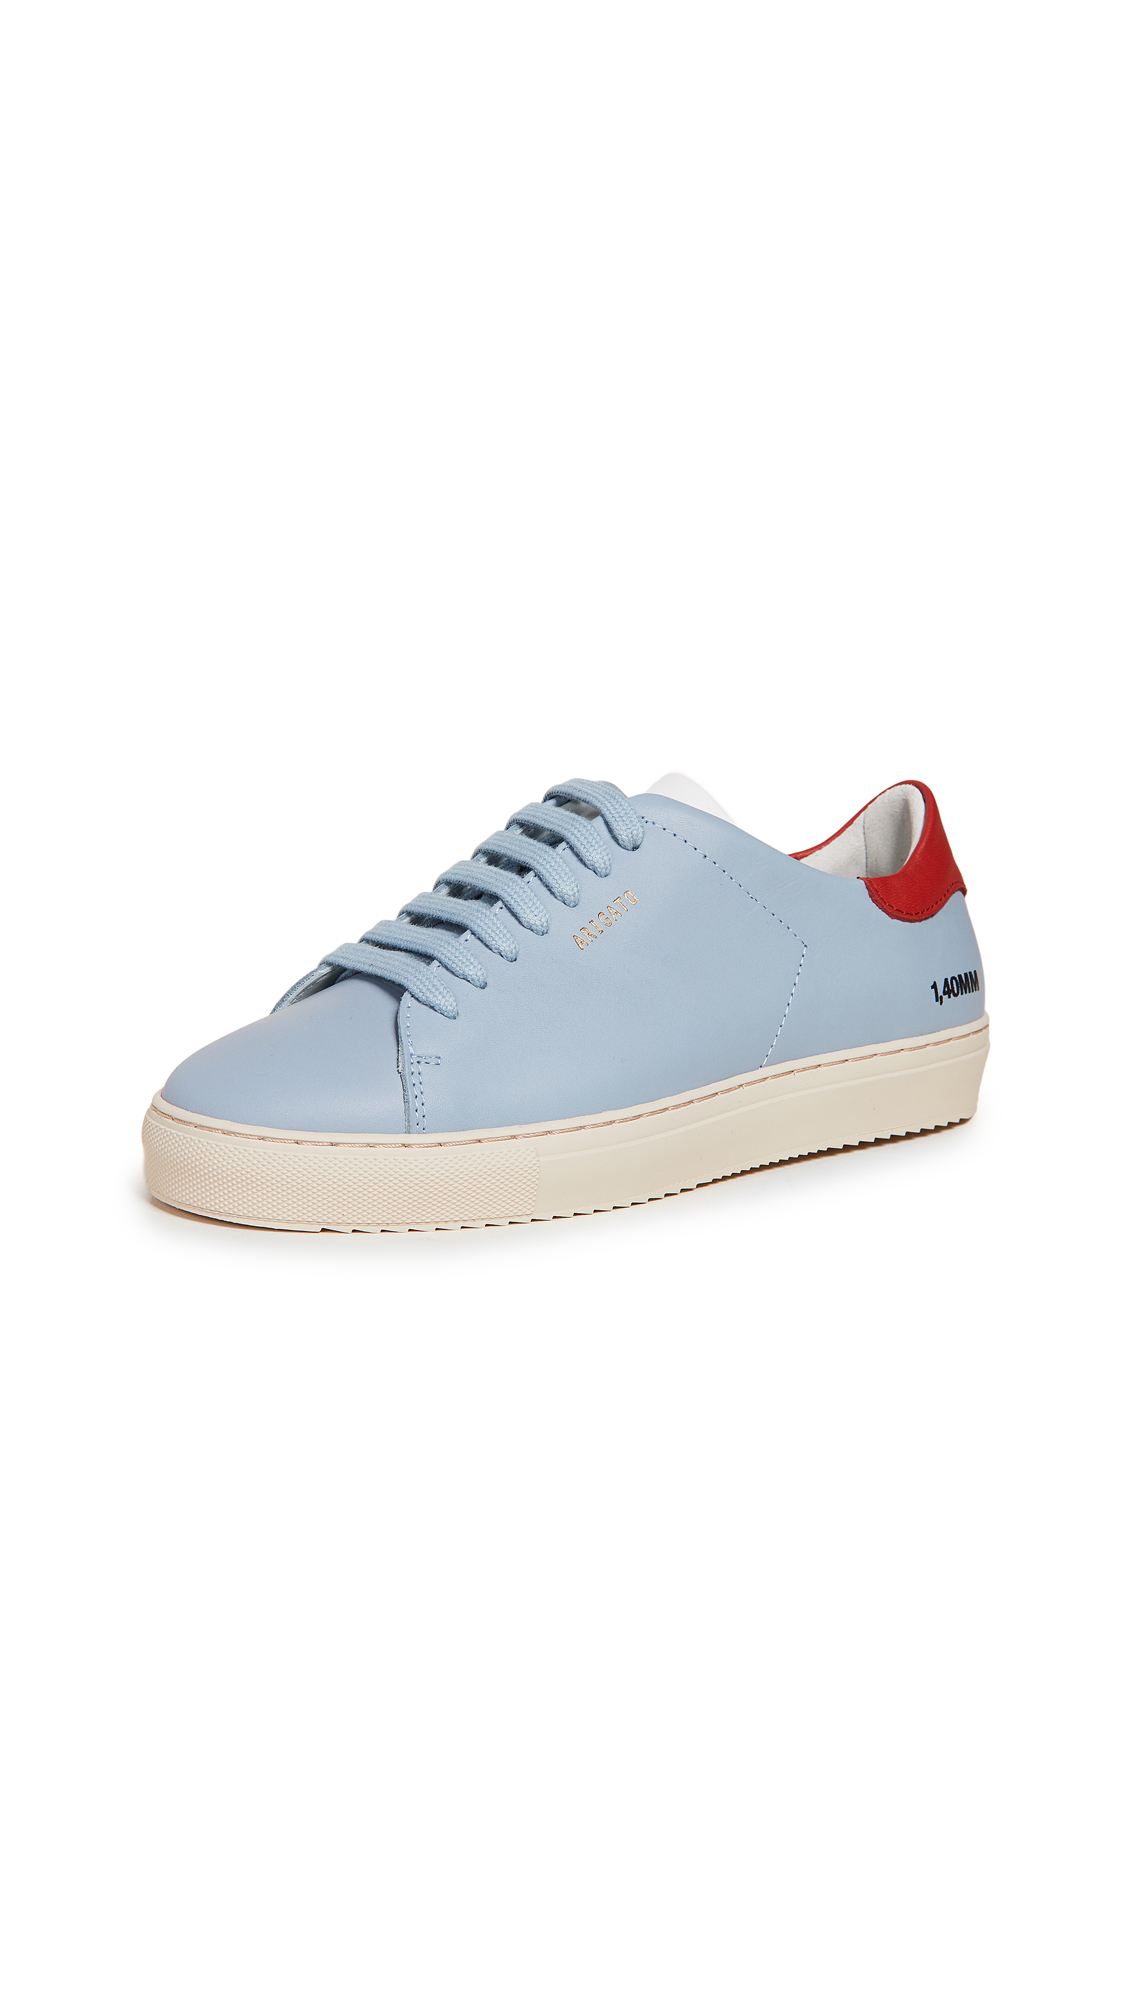 Axel Arigato Clean 90 Multicolor Sneakers - Light Blue/Multi